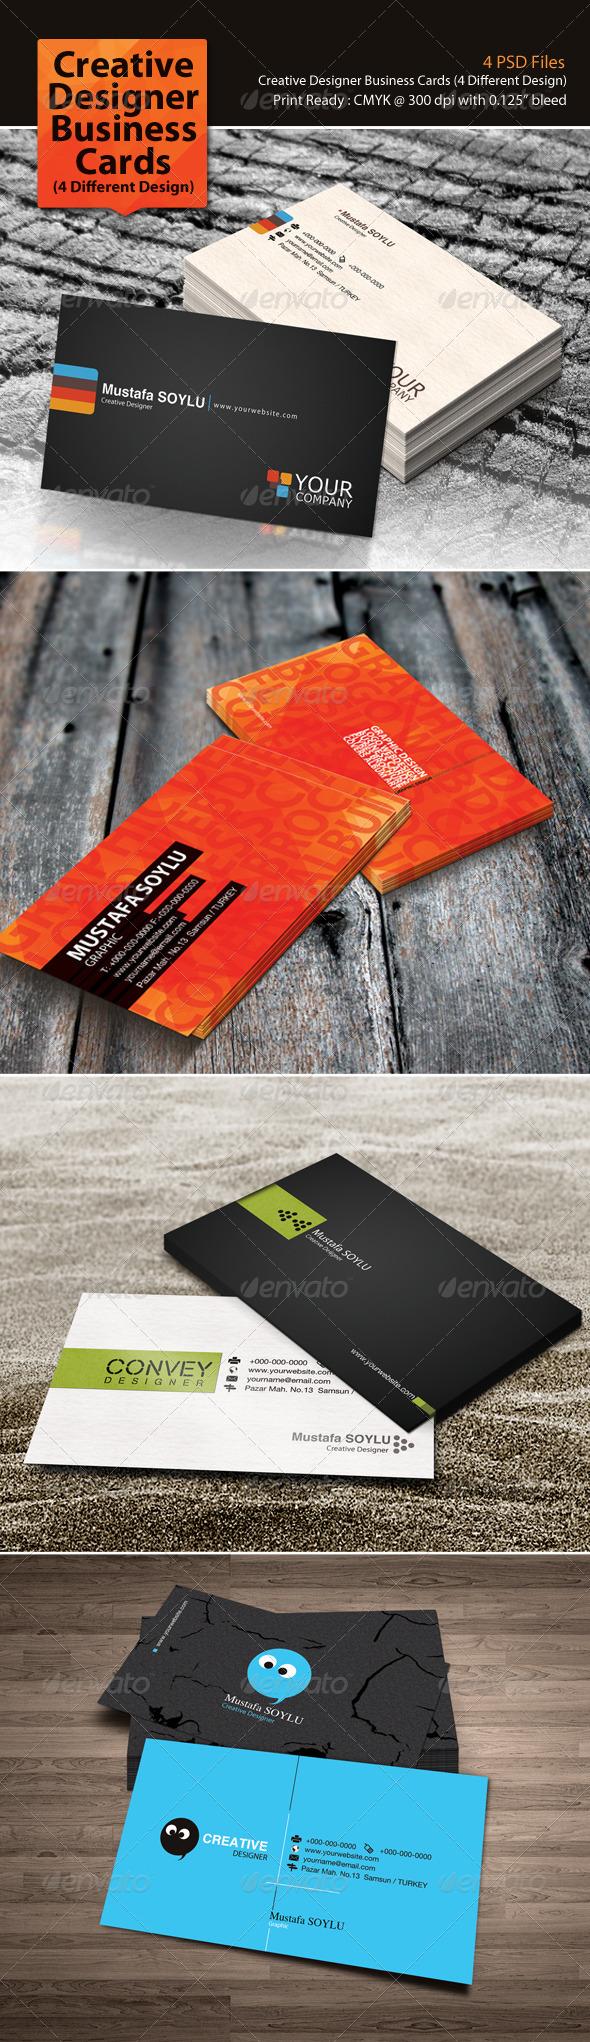 GraphicRiver Creative Designer Business Cards Pack 3187399